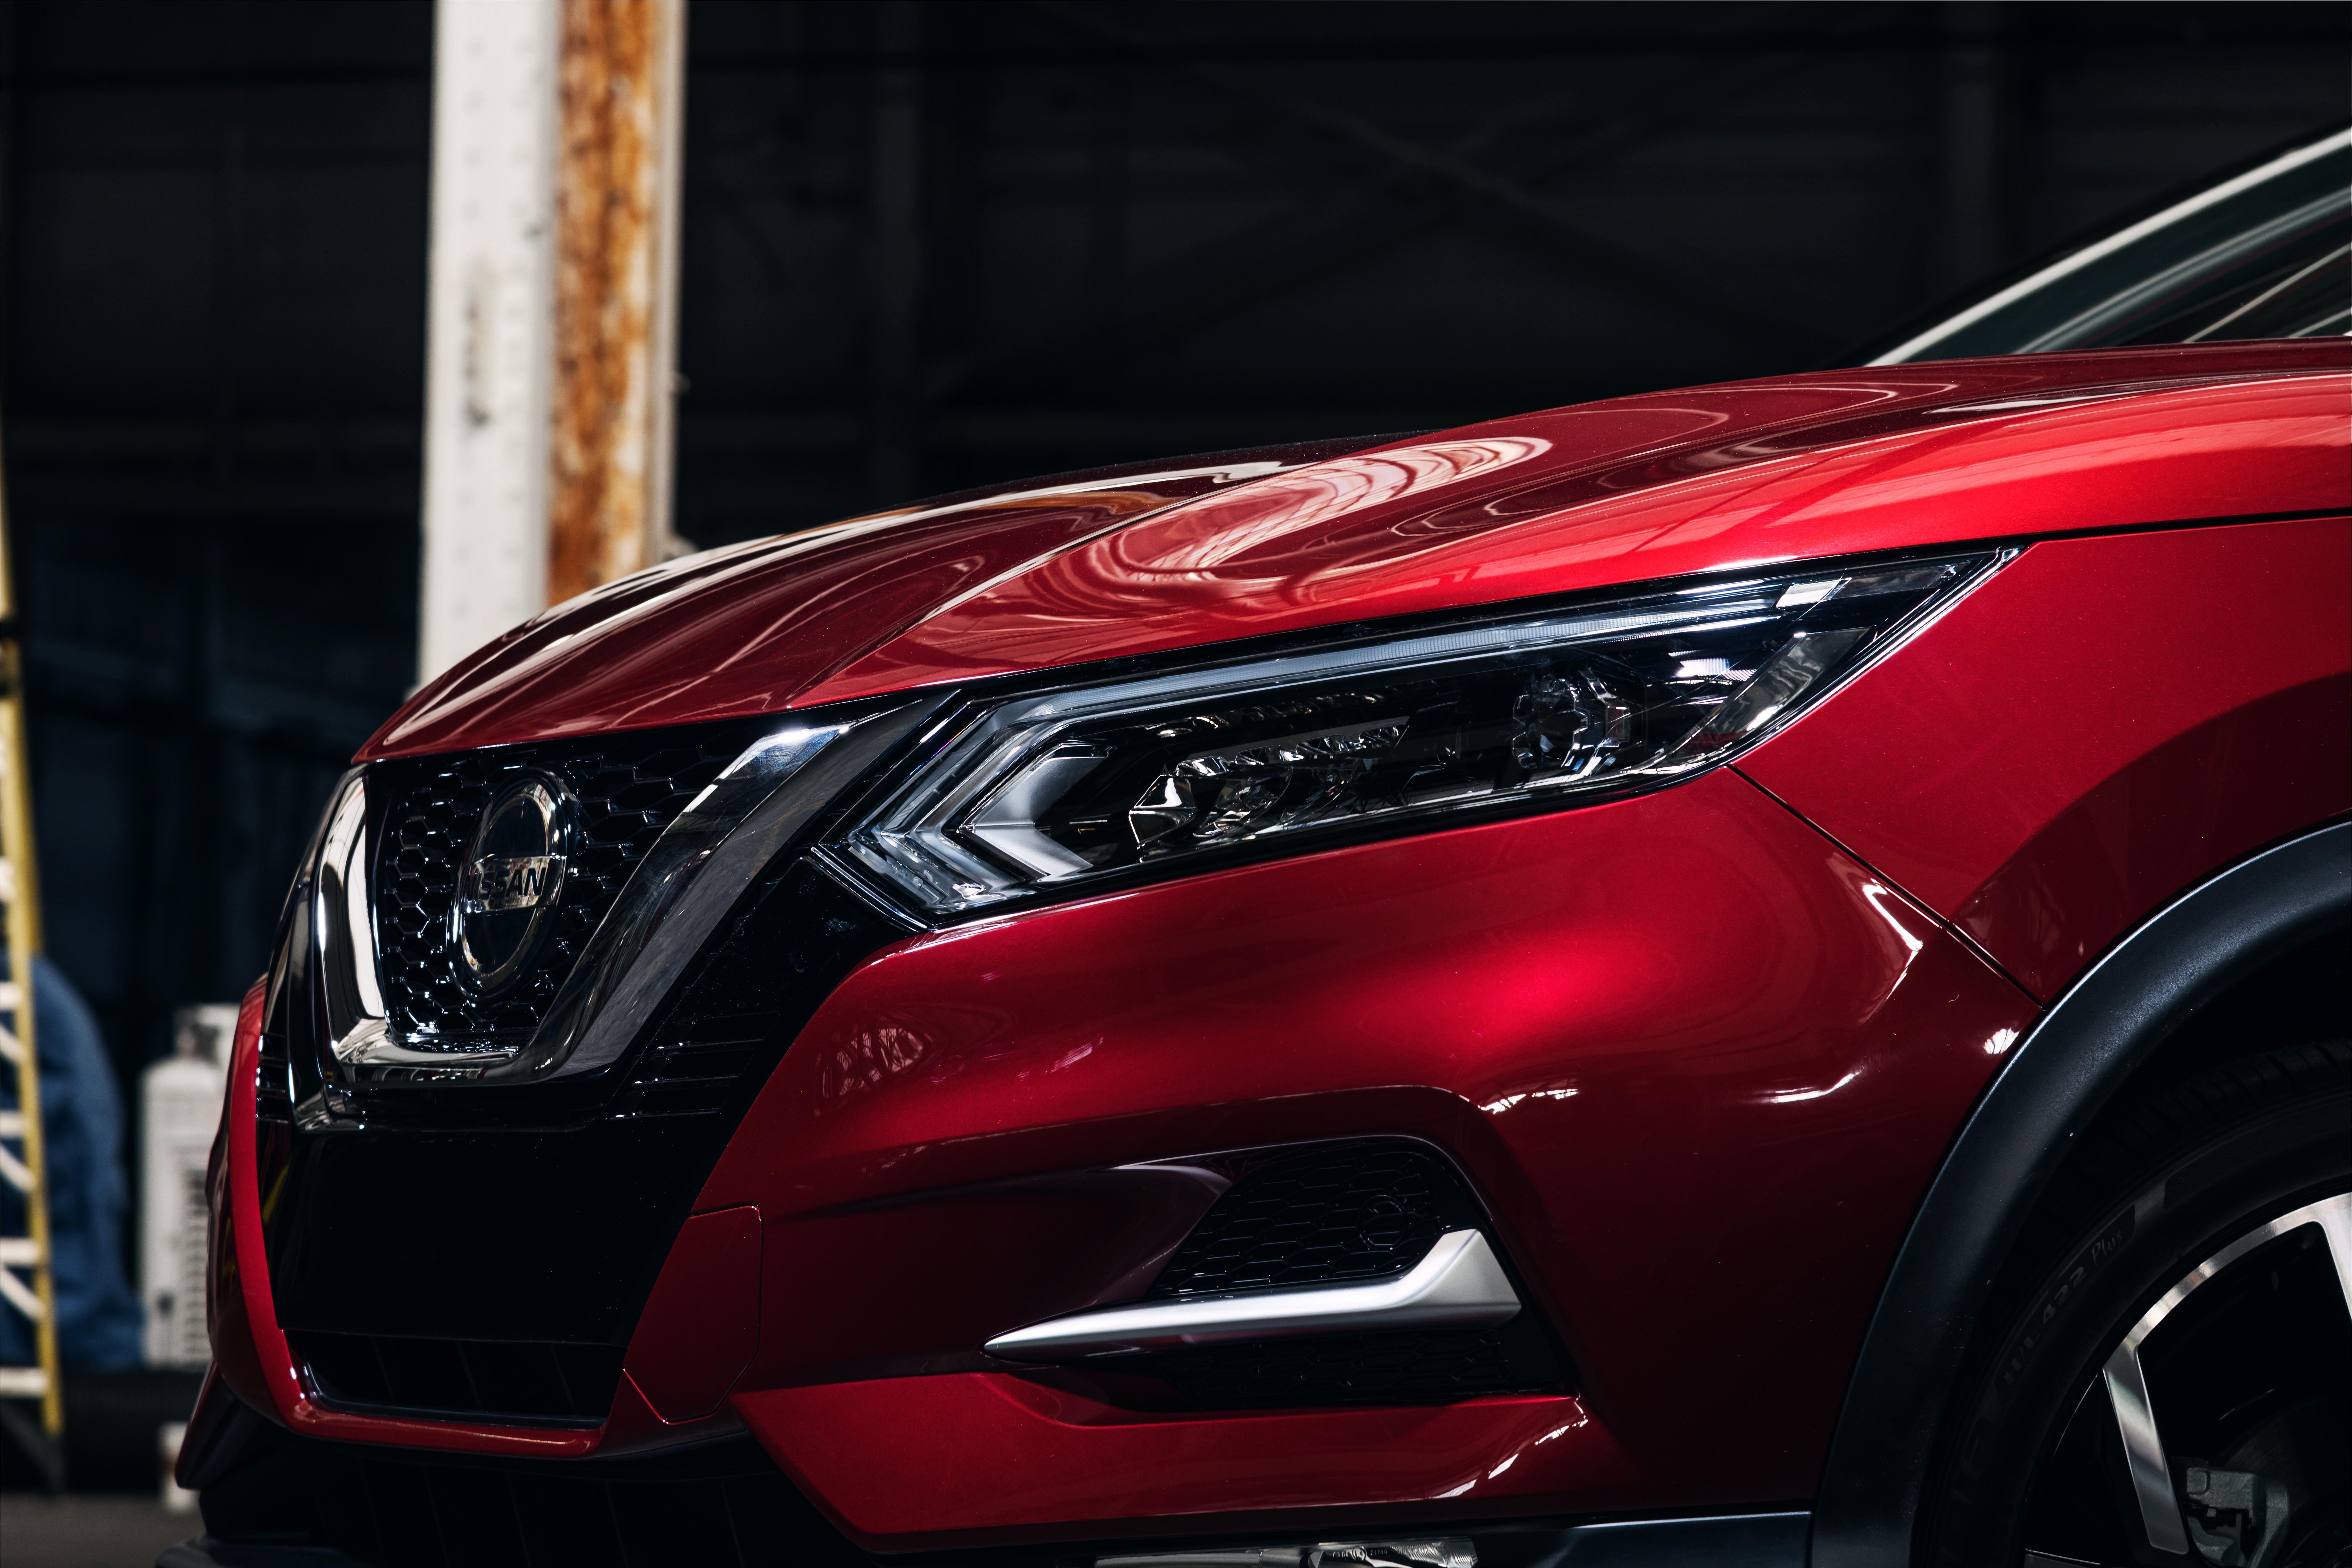 2020 Nissan Rogue Sport 536144 Best Quality Free High